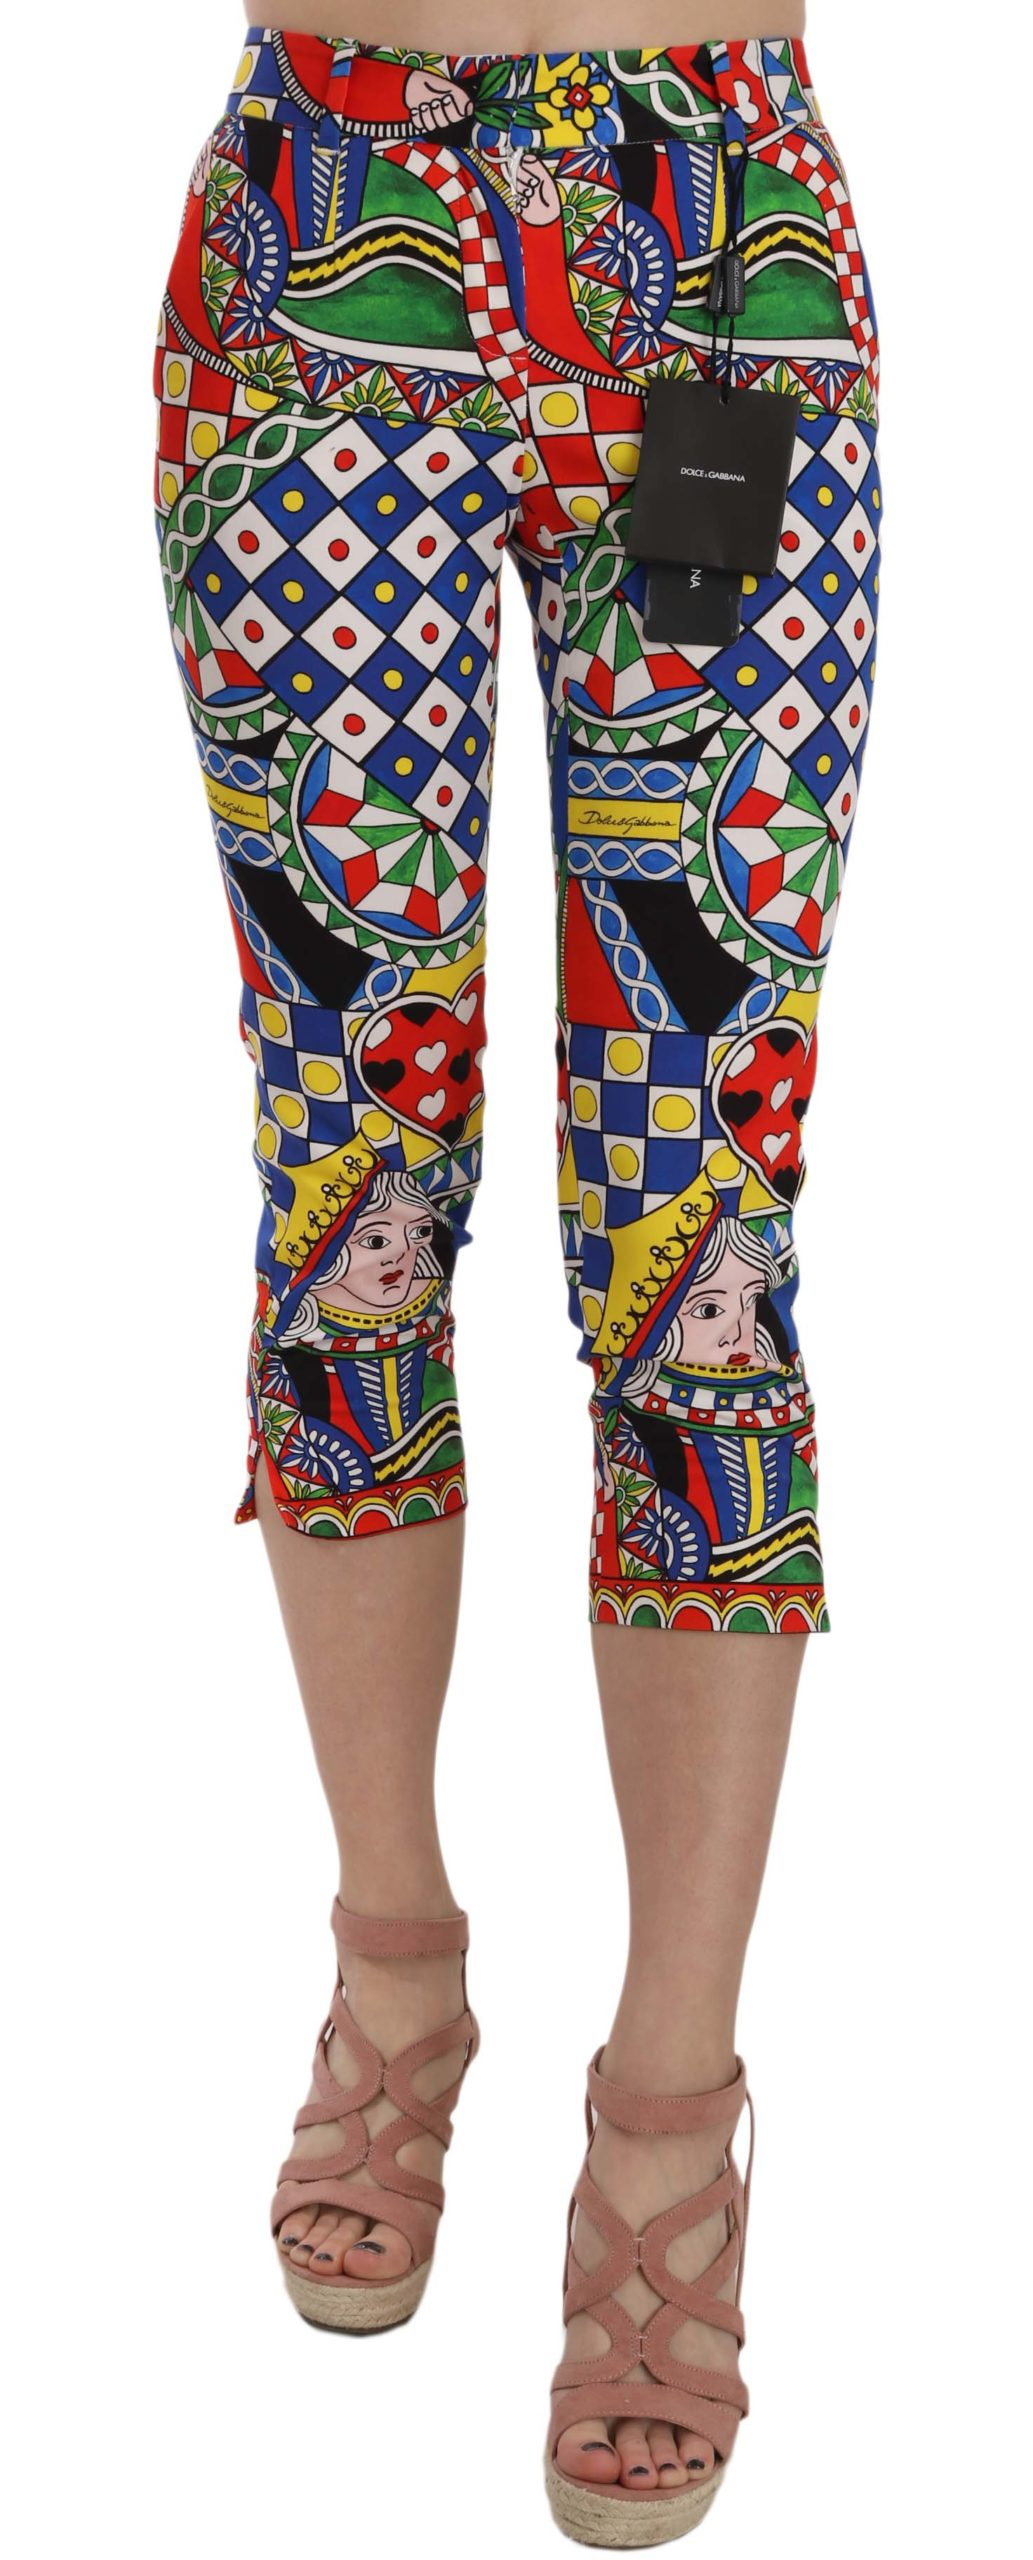 Dolce & Gabbana Women's Queen Of Hearts Print Cotton Capri Trouser Multicolor PAN70006 - IT36|XXS